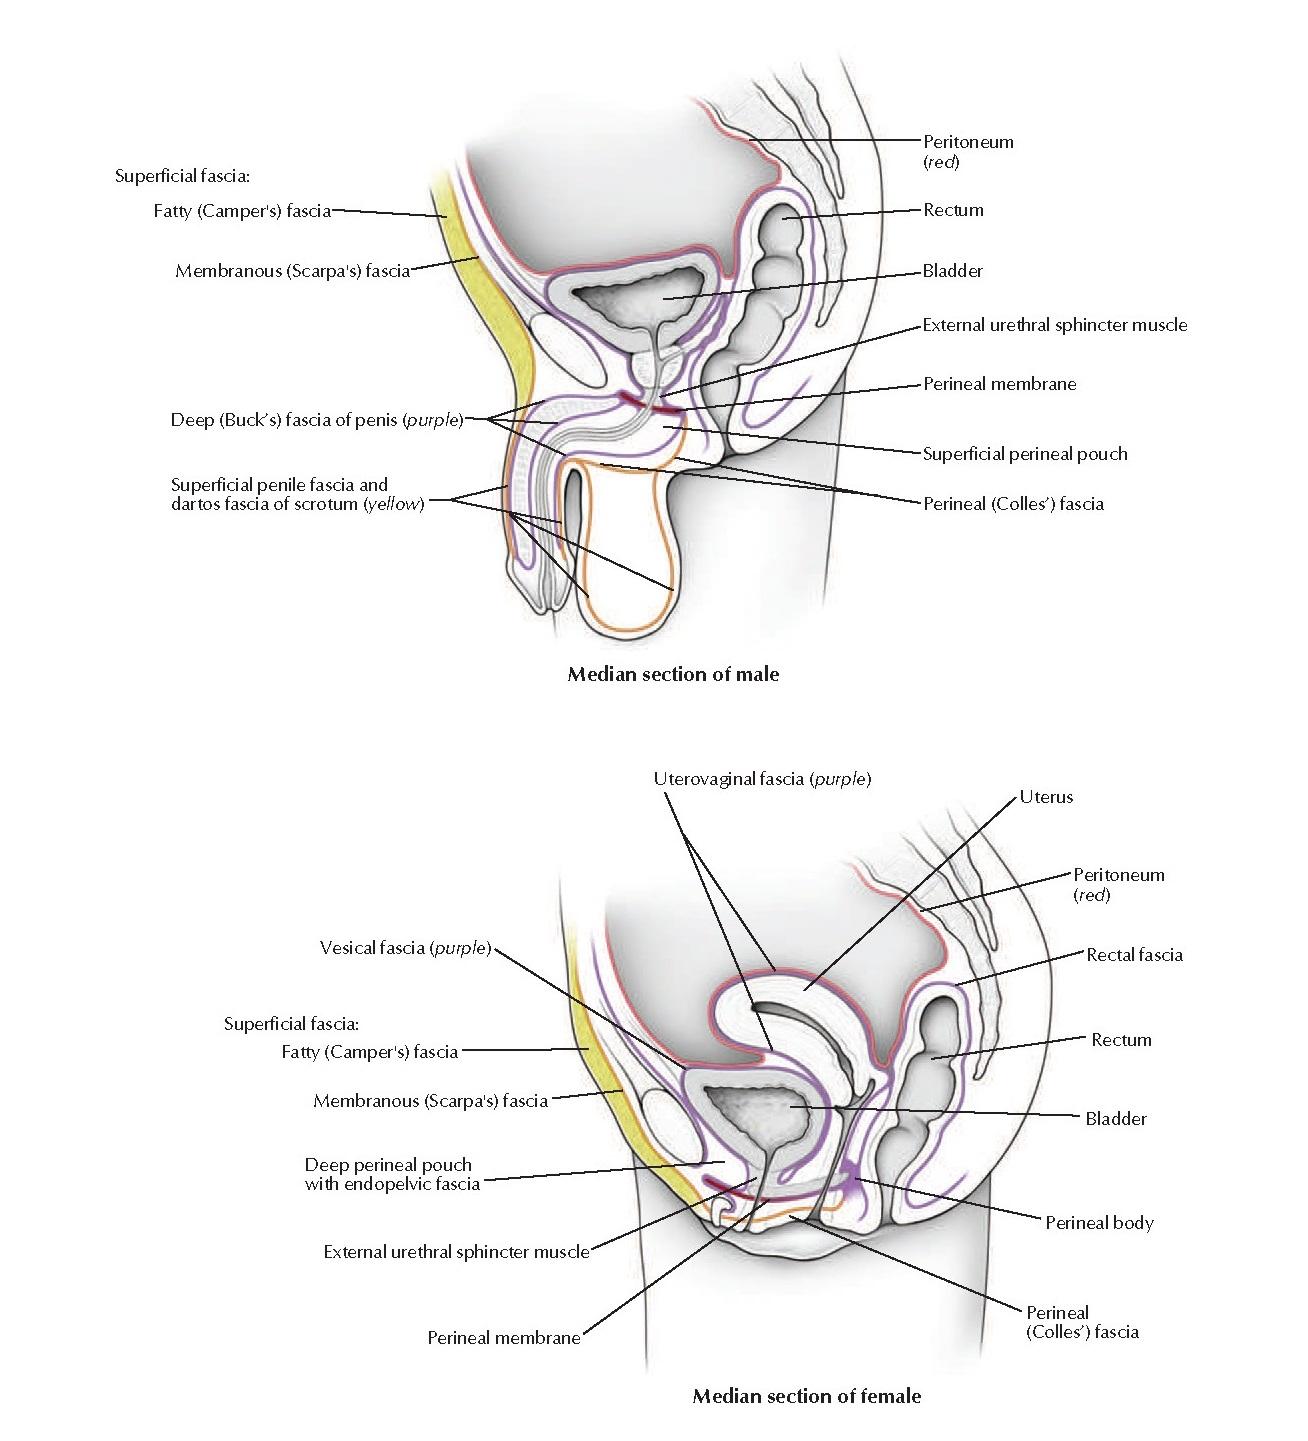 Fasciae of Male and Female Pelvis and Perineum Anatomy